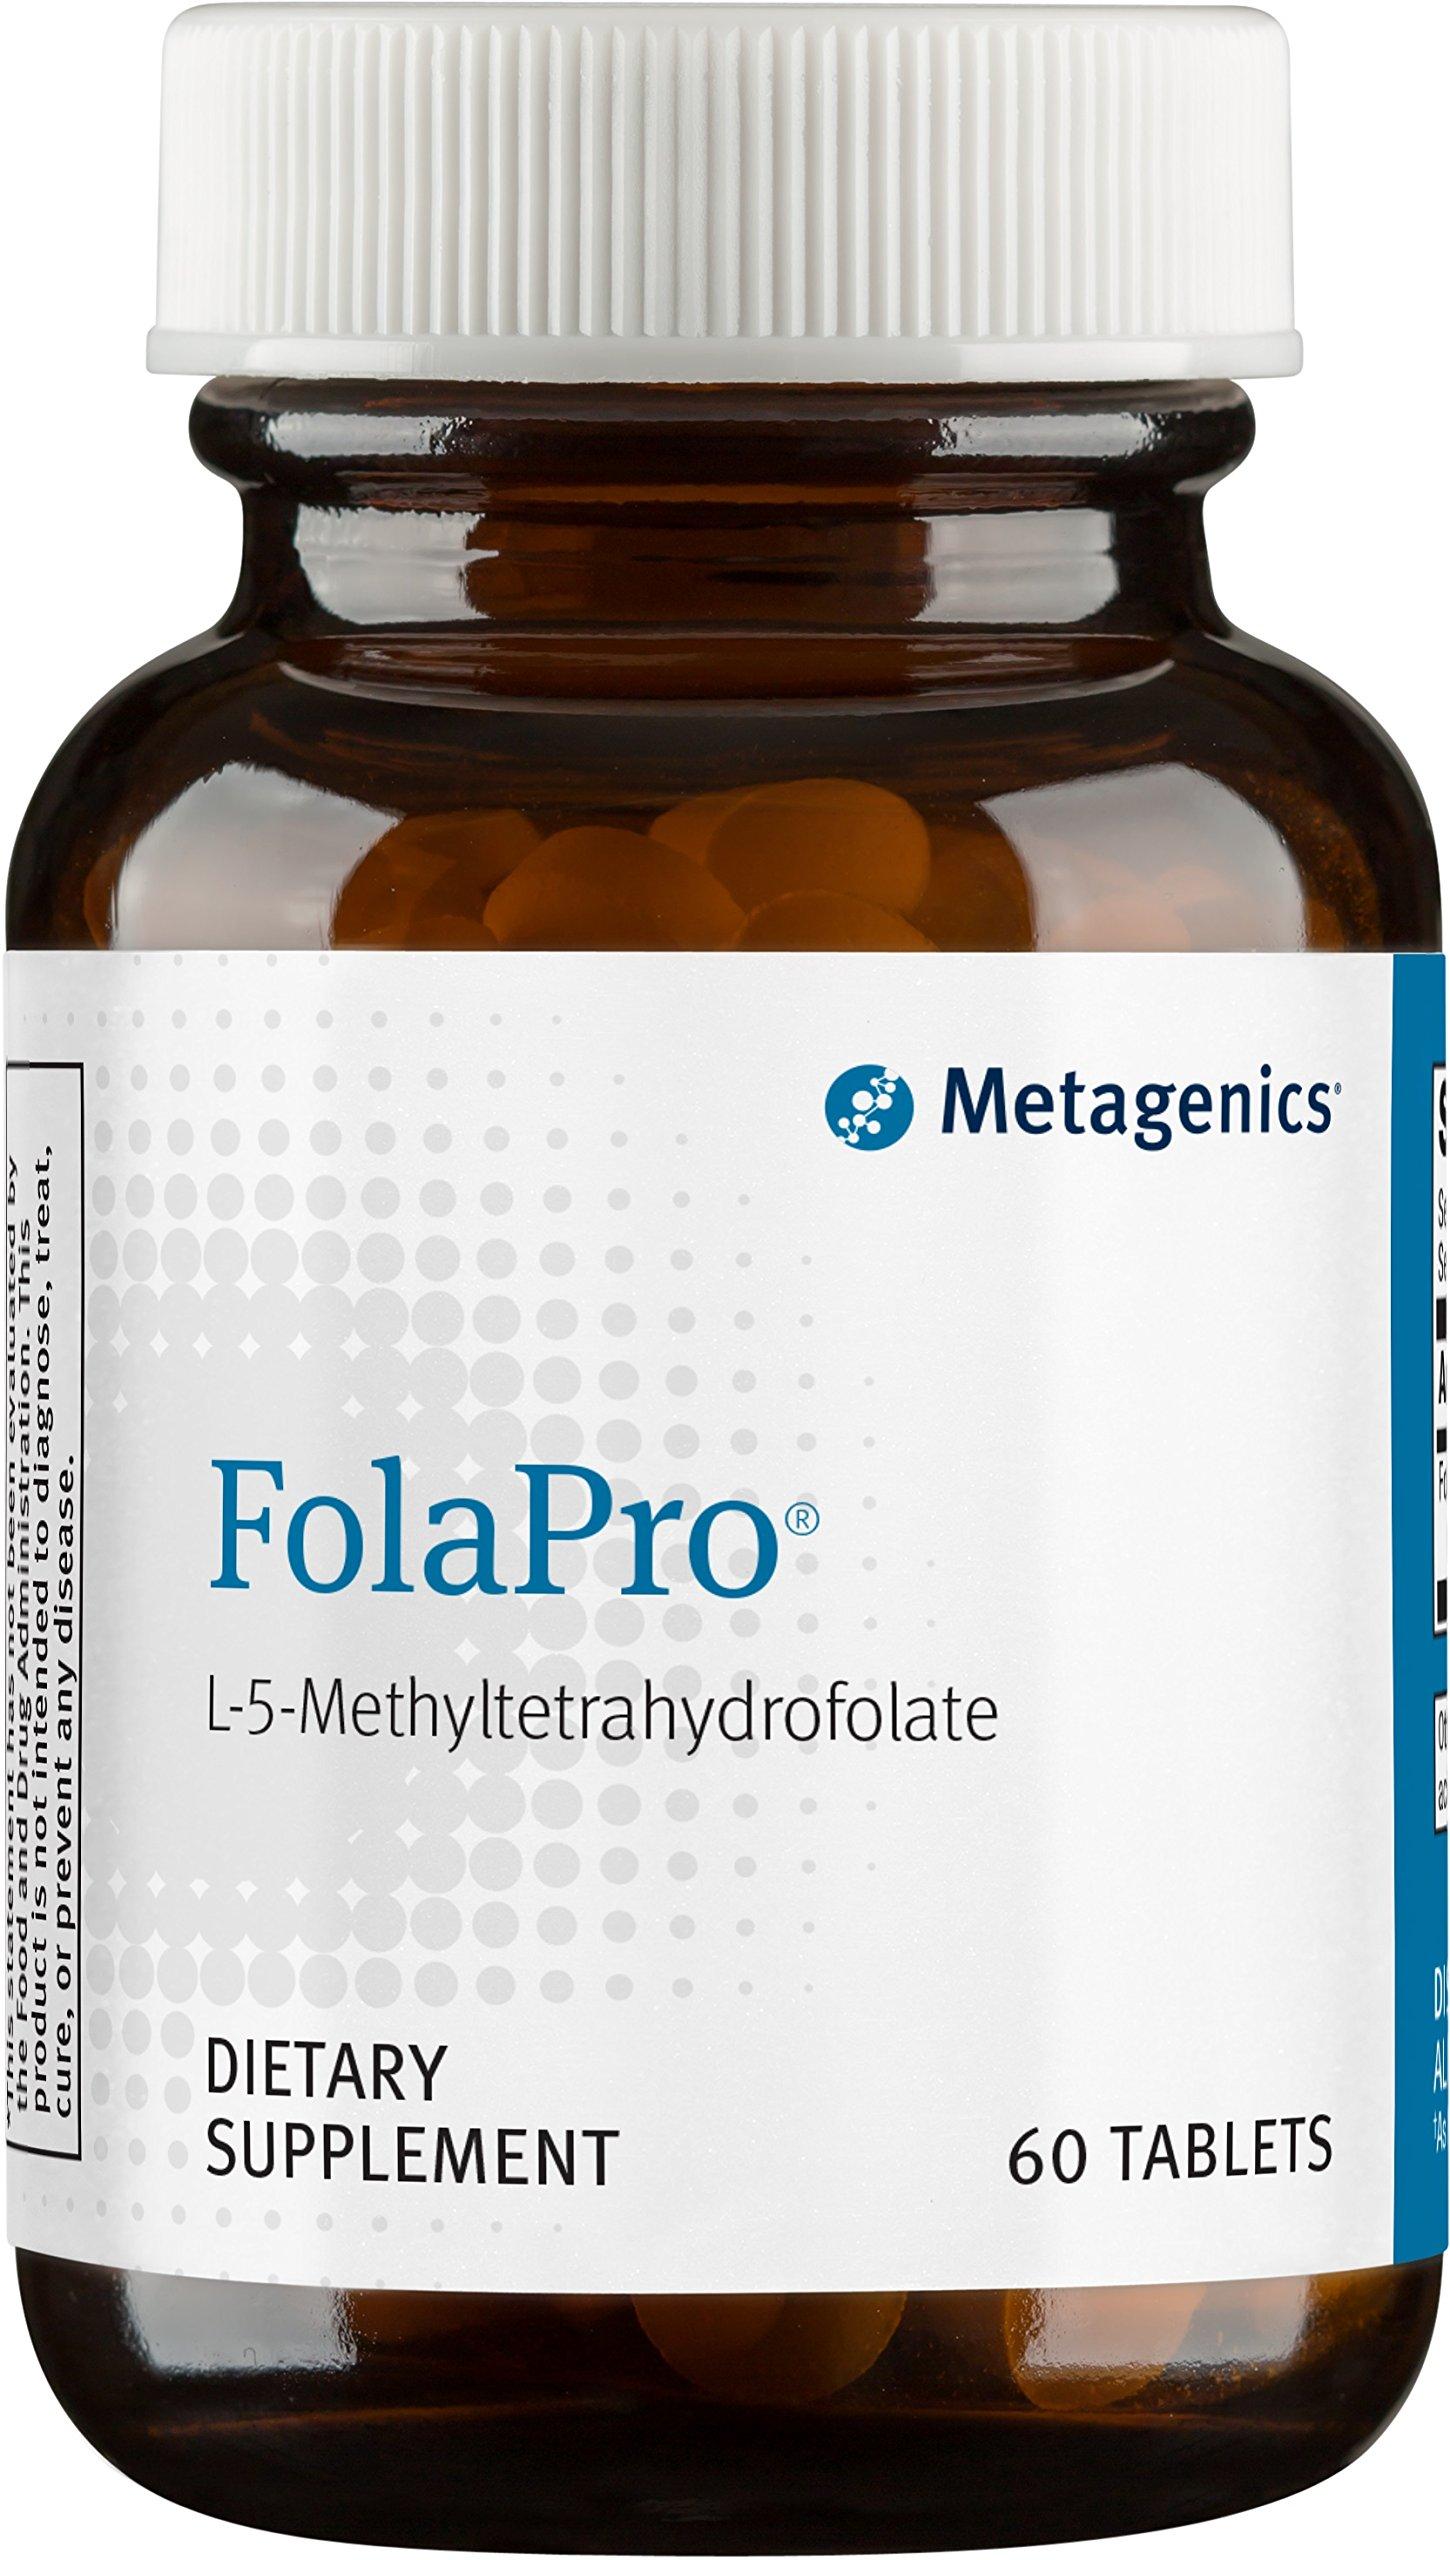 Metagenics - FolaPro, 60 Count